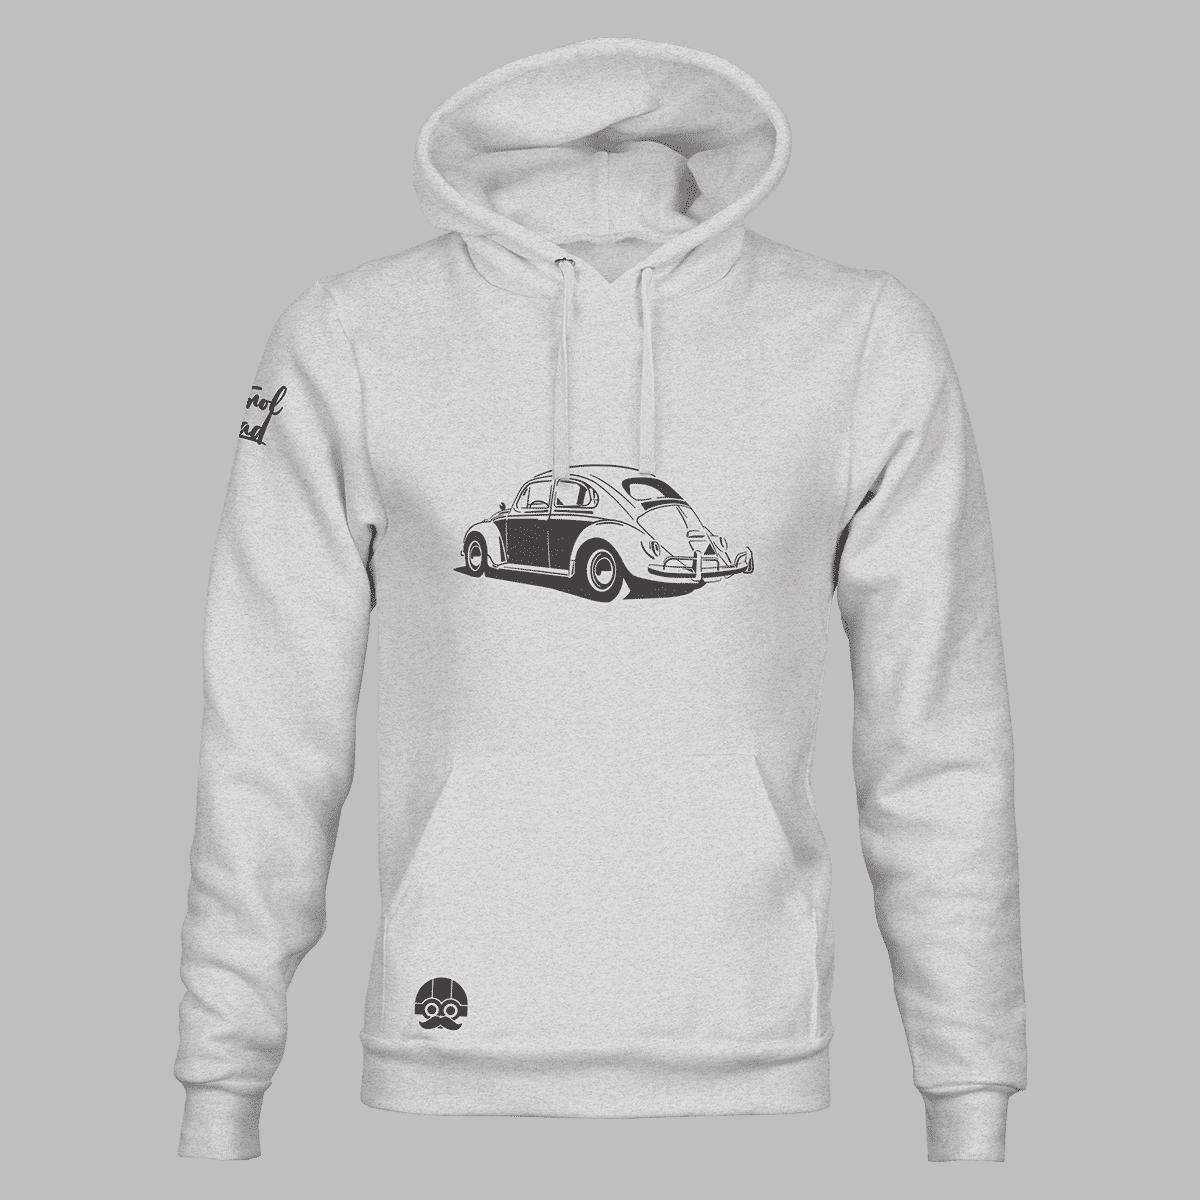 Bluza męska kangurka dla fanów Volkswagena Garbusa